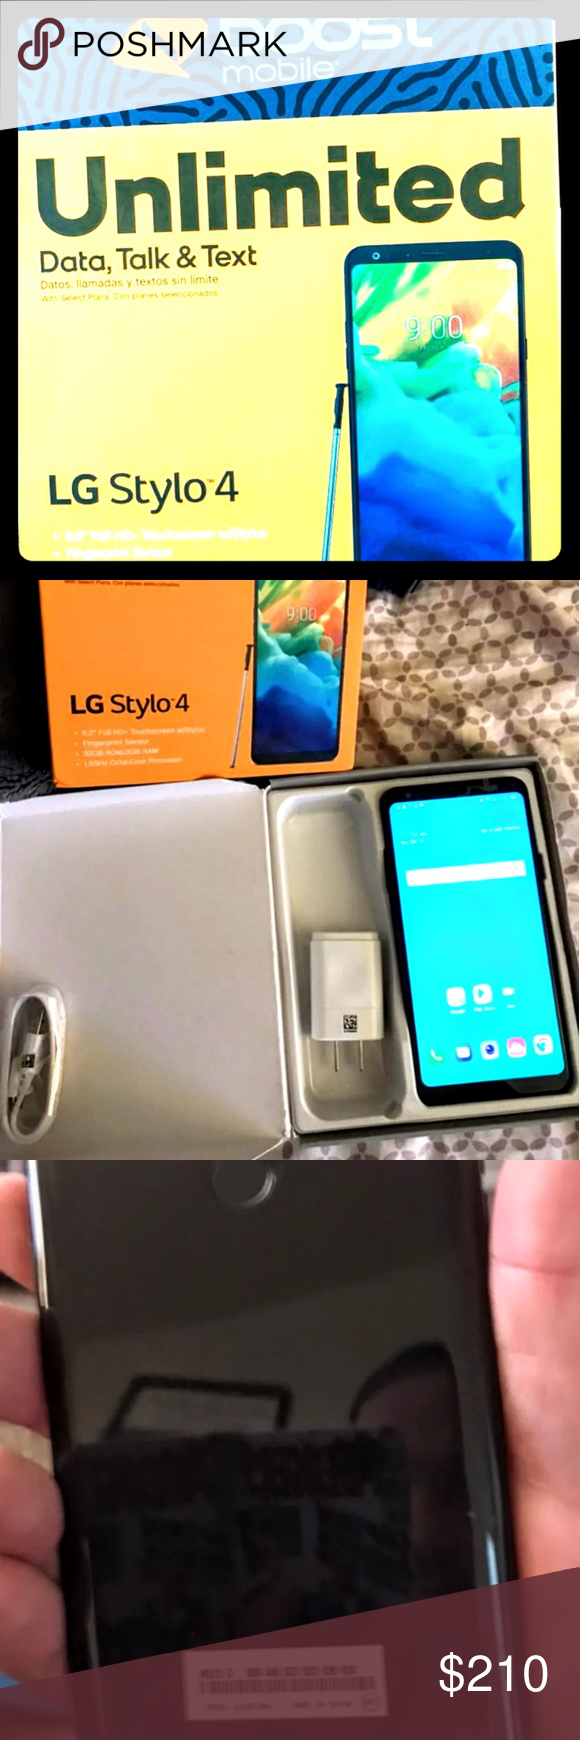 LG Stylo 4 PLUS  HANDS FREE Ear bud  2 SLIM CASES New in box